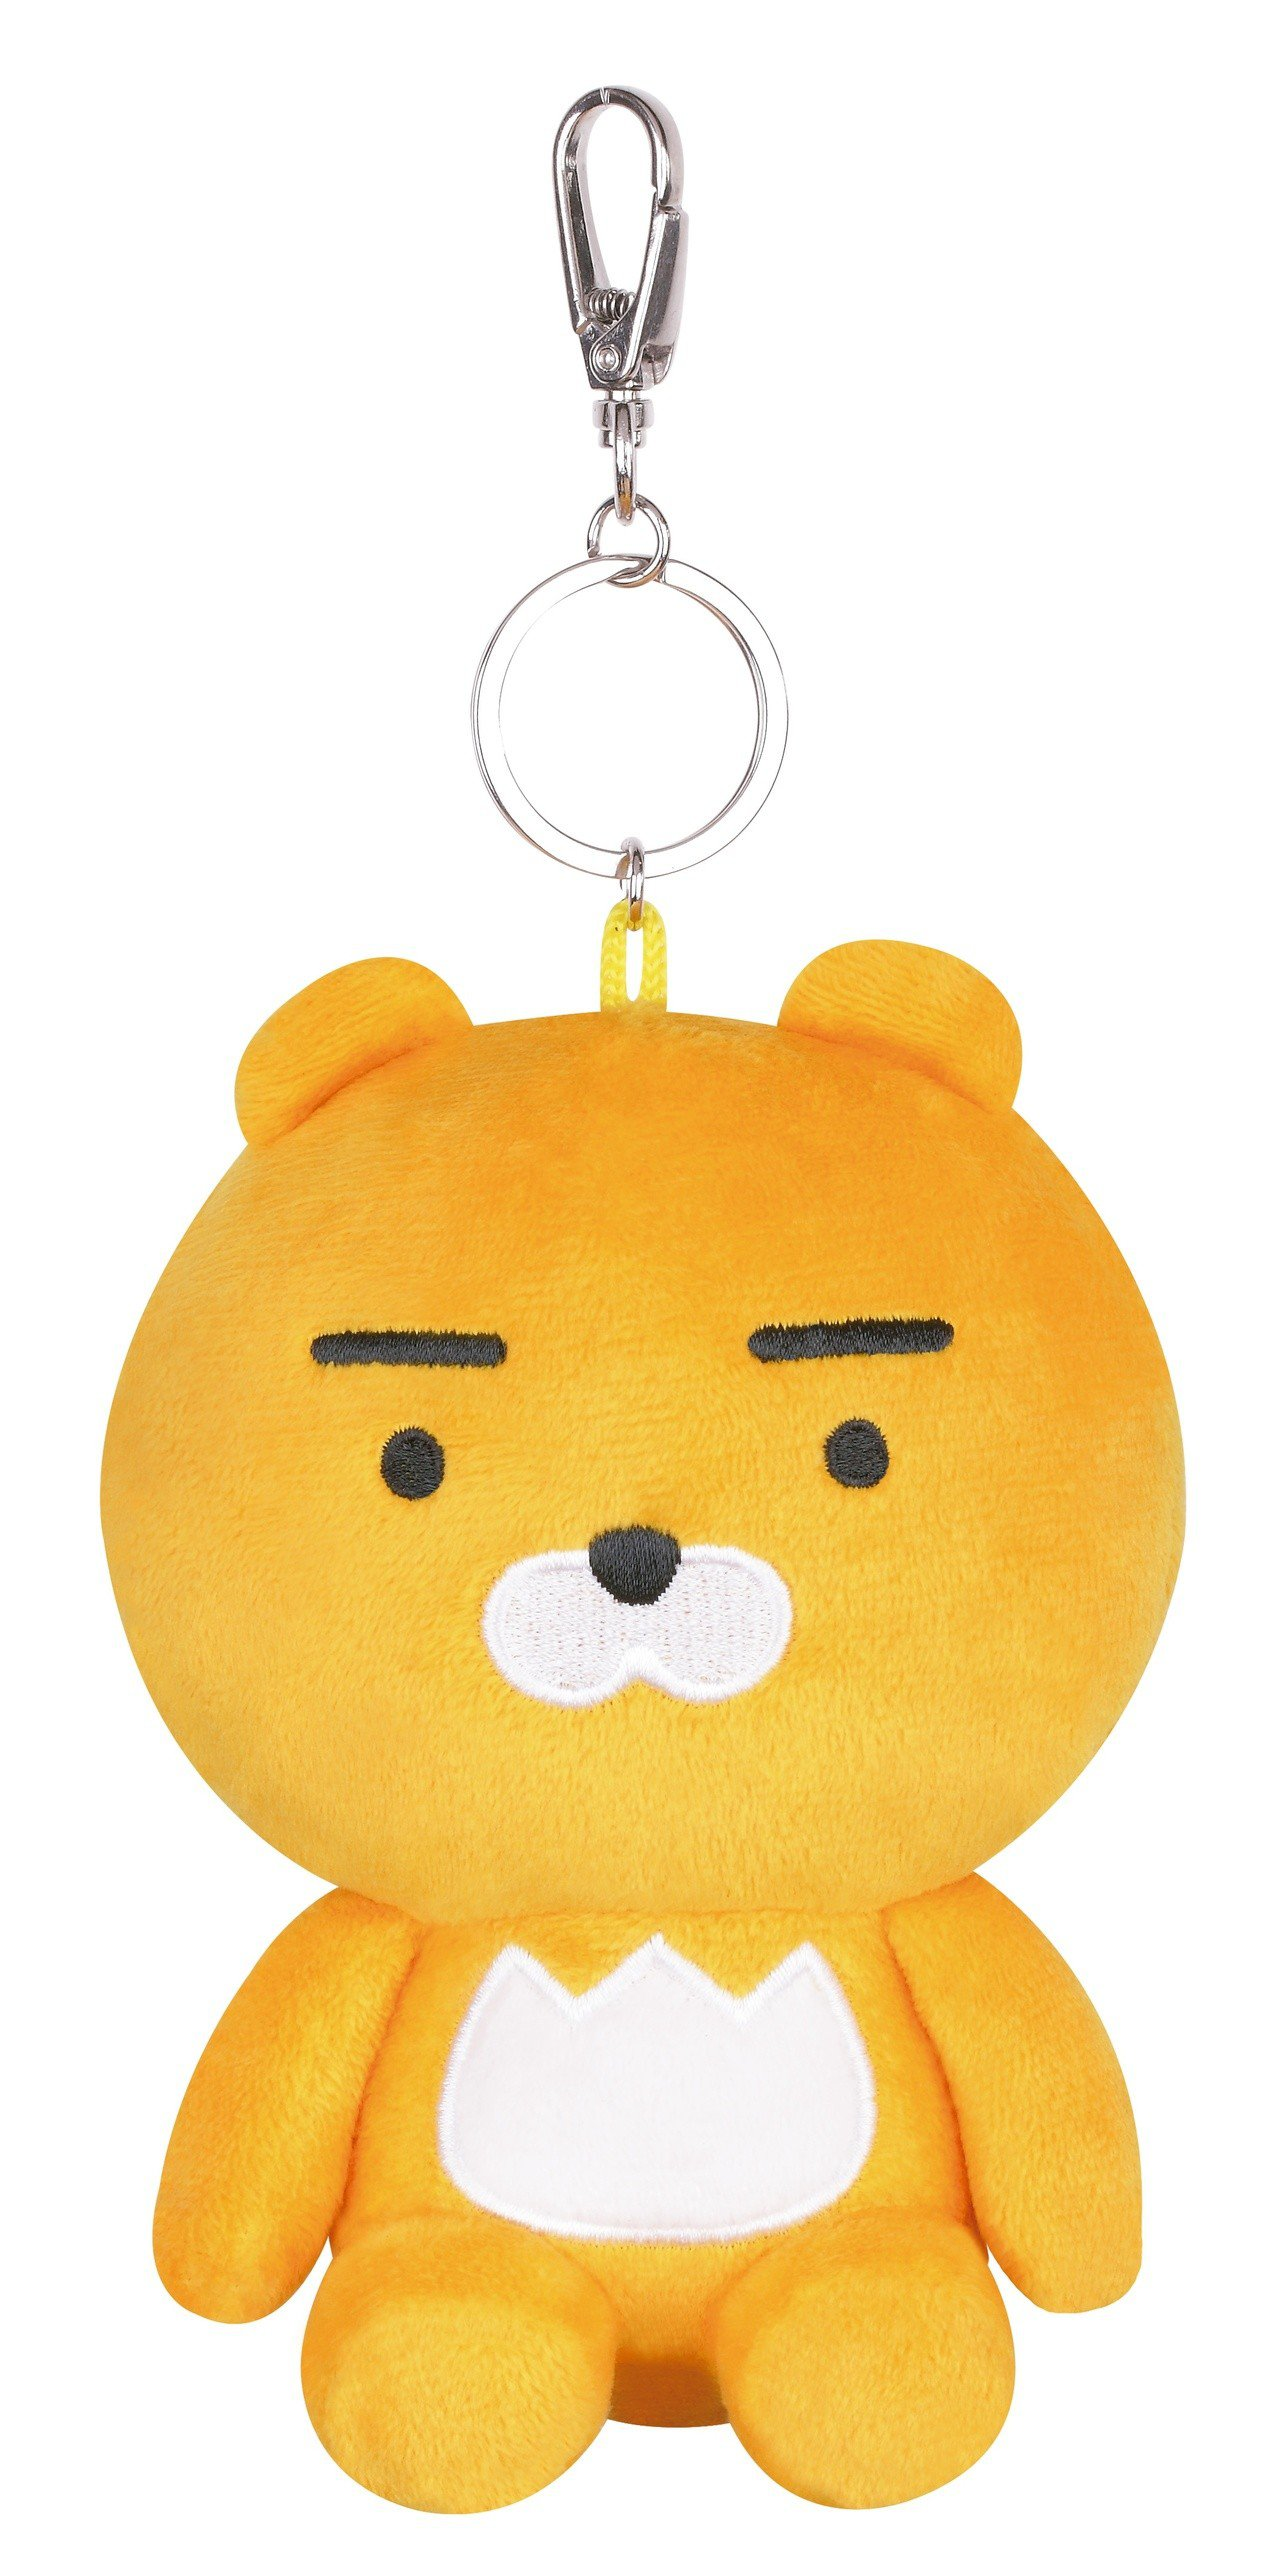 Kakao Friends玩偶吊飾-Ryan,800點+149元可換購一款(隨機...